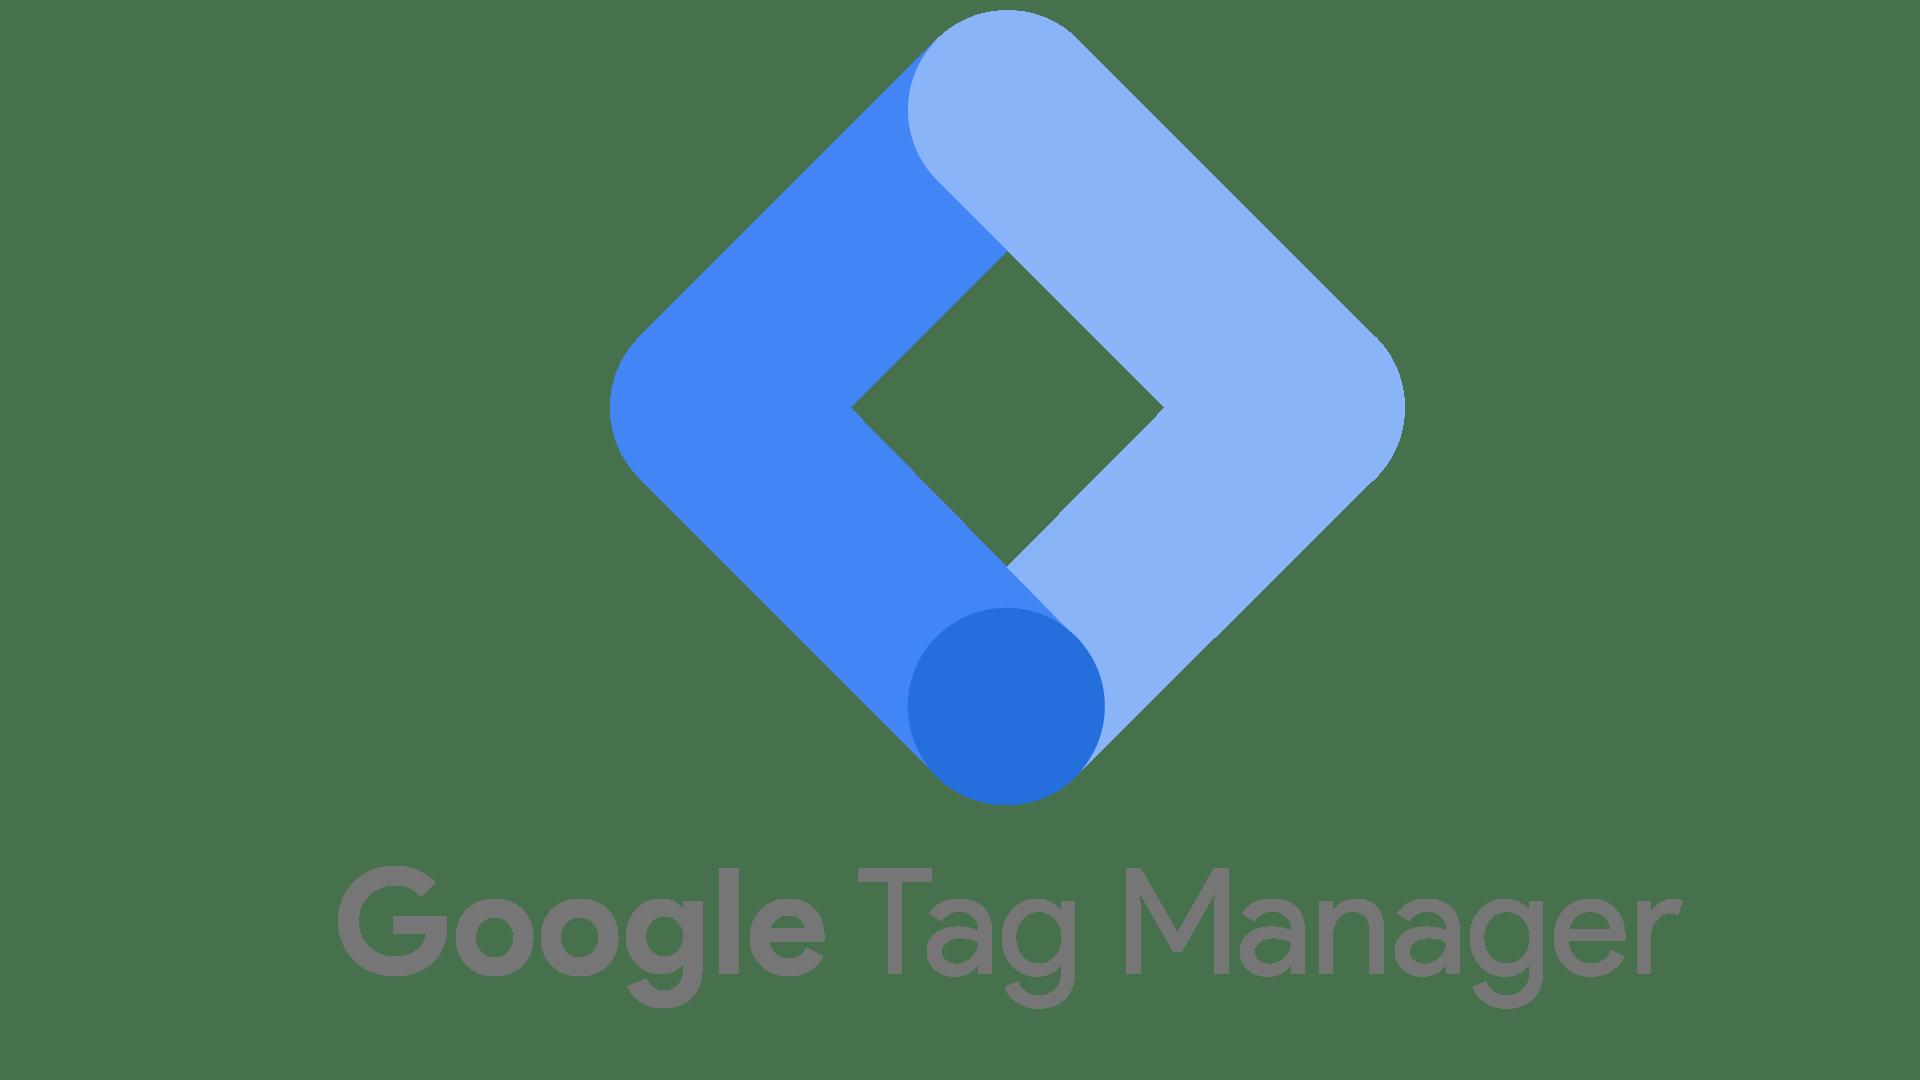 Google Tag Manager, Long media